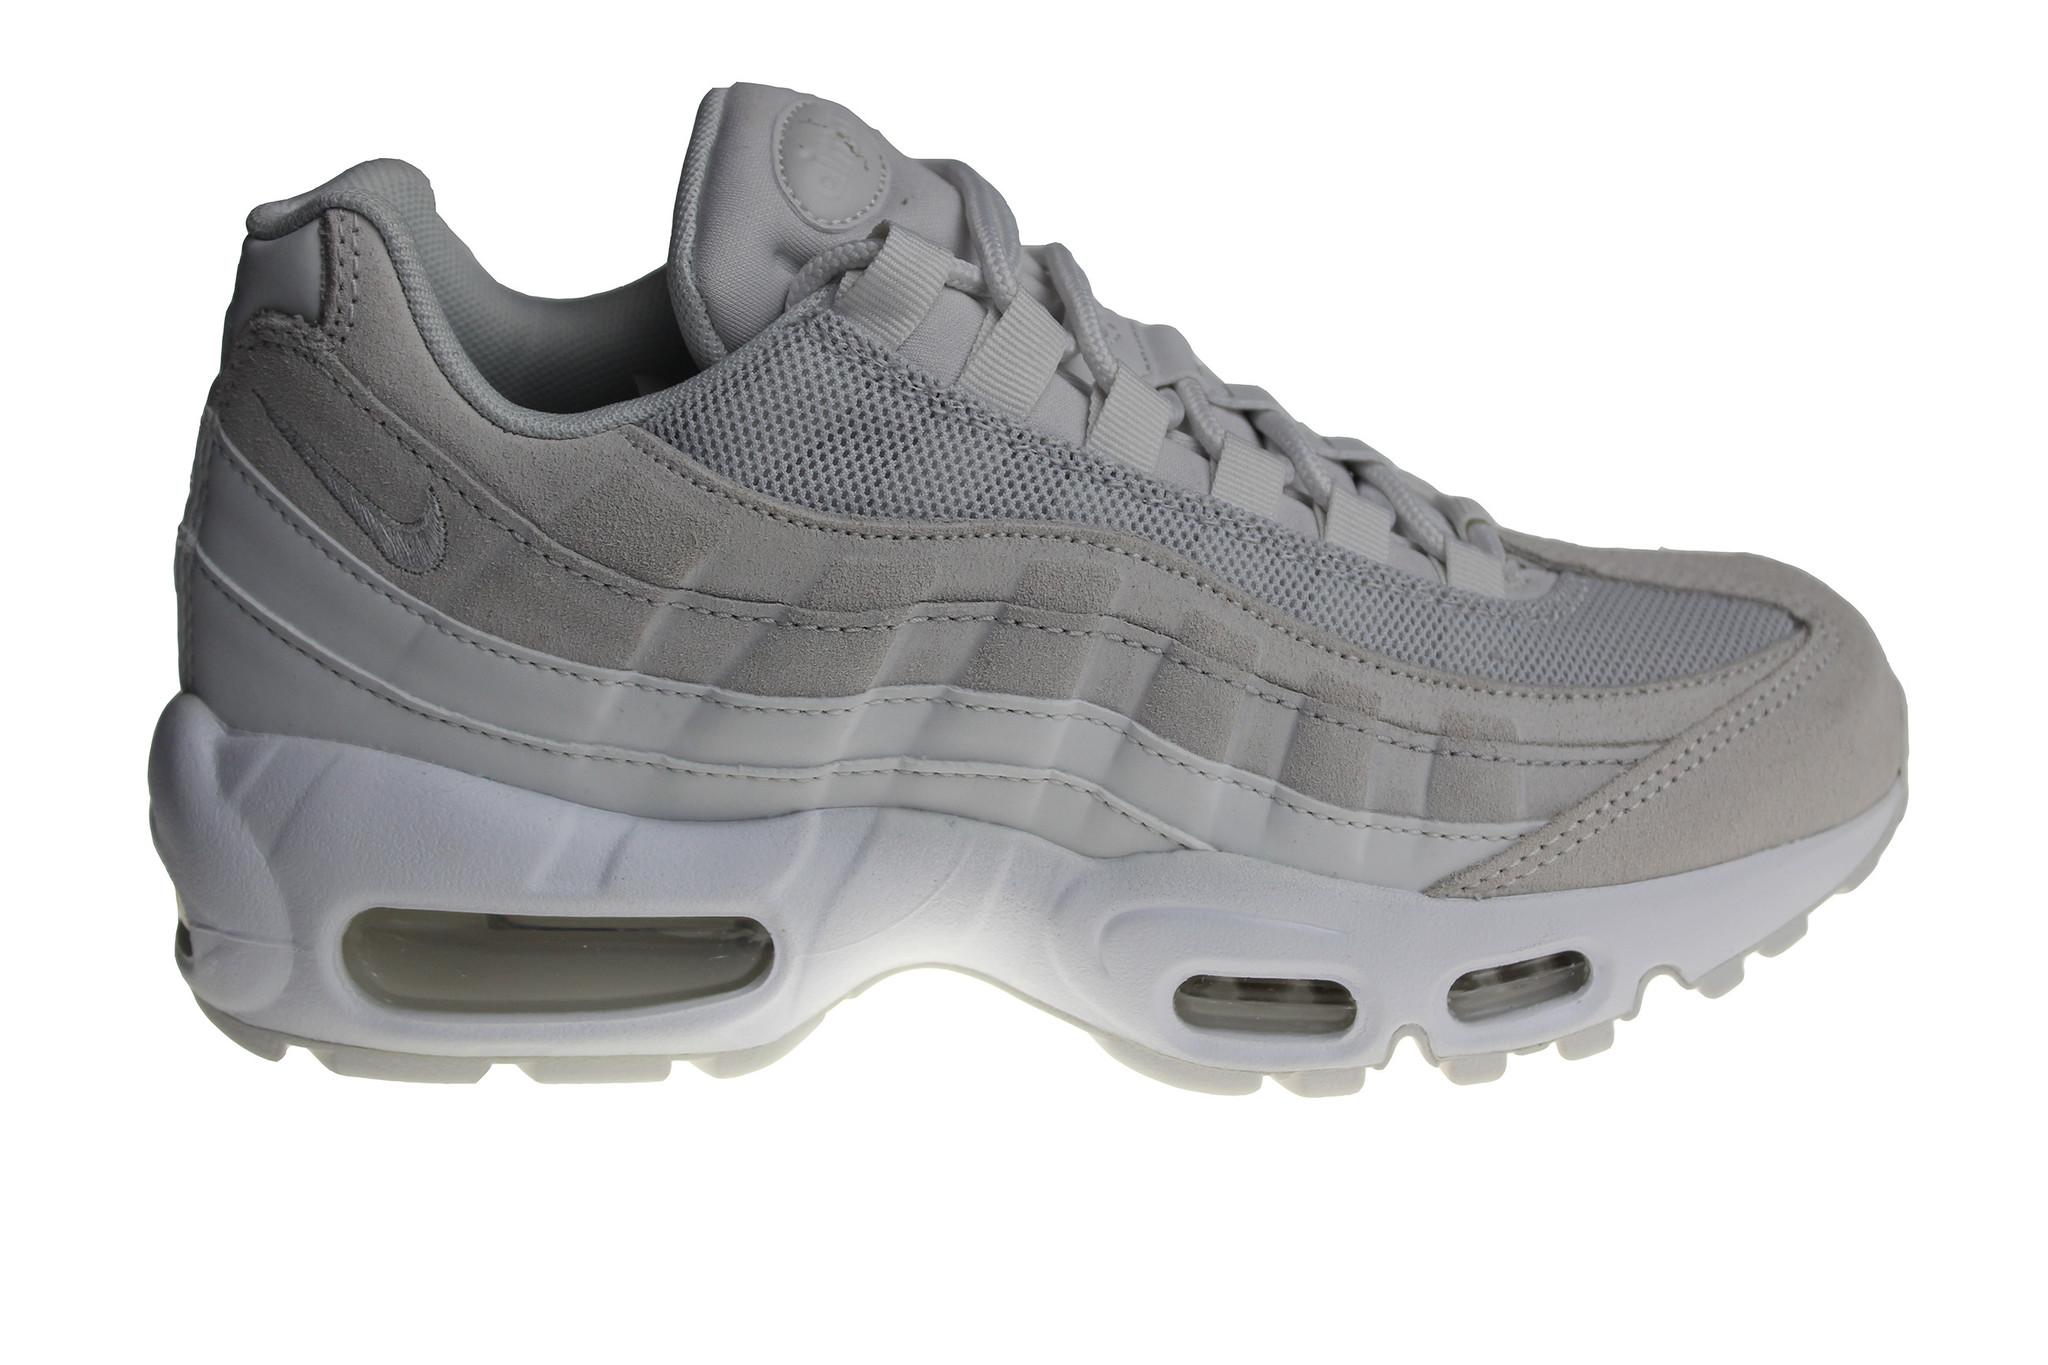 sports shoes 05480 057d1 Nike Wmns Air Max 95 Prm 807443 018 (Grey/White)